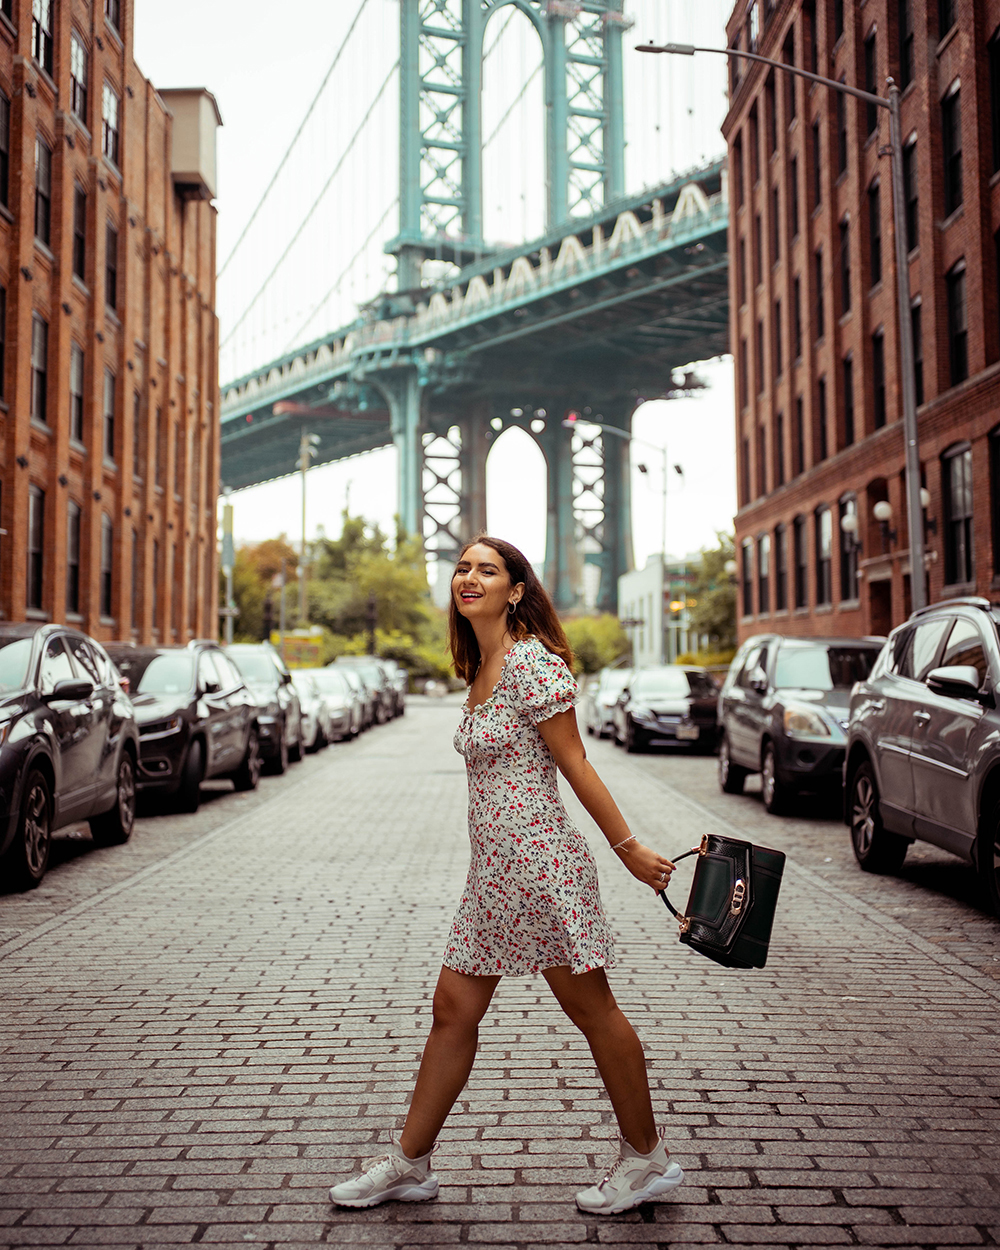 Postcards from Hawaii, NYC, New York City, Itinerary, Manhattan Bridge